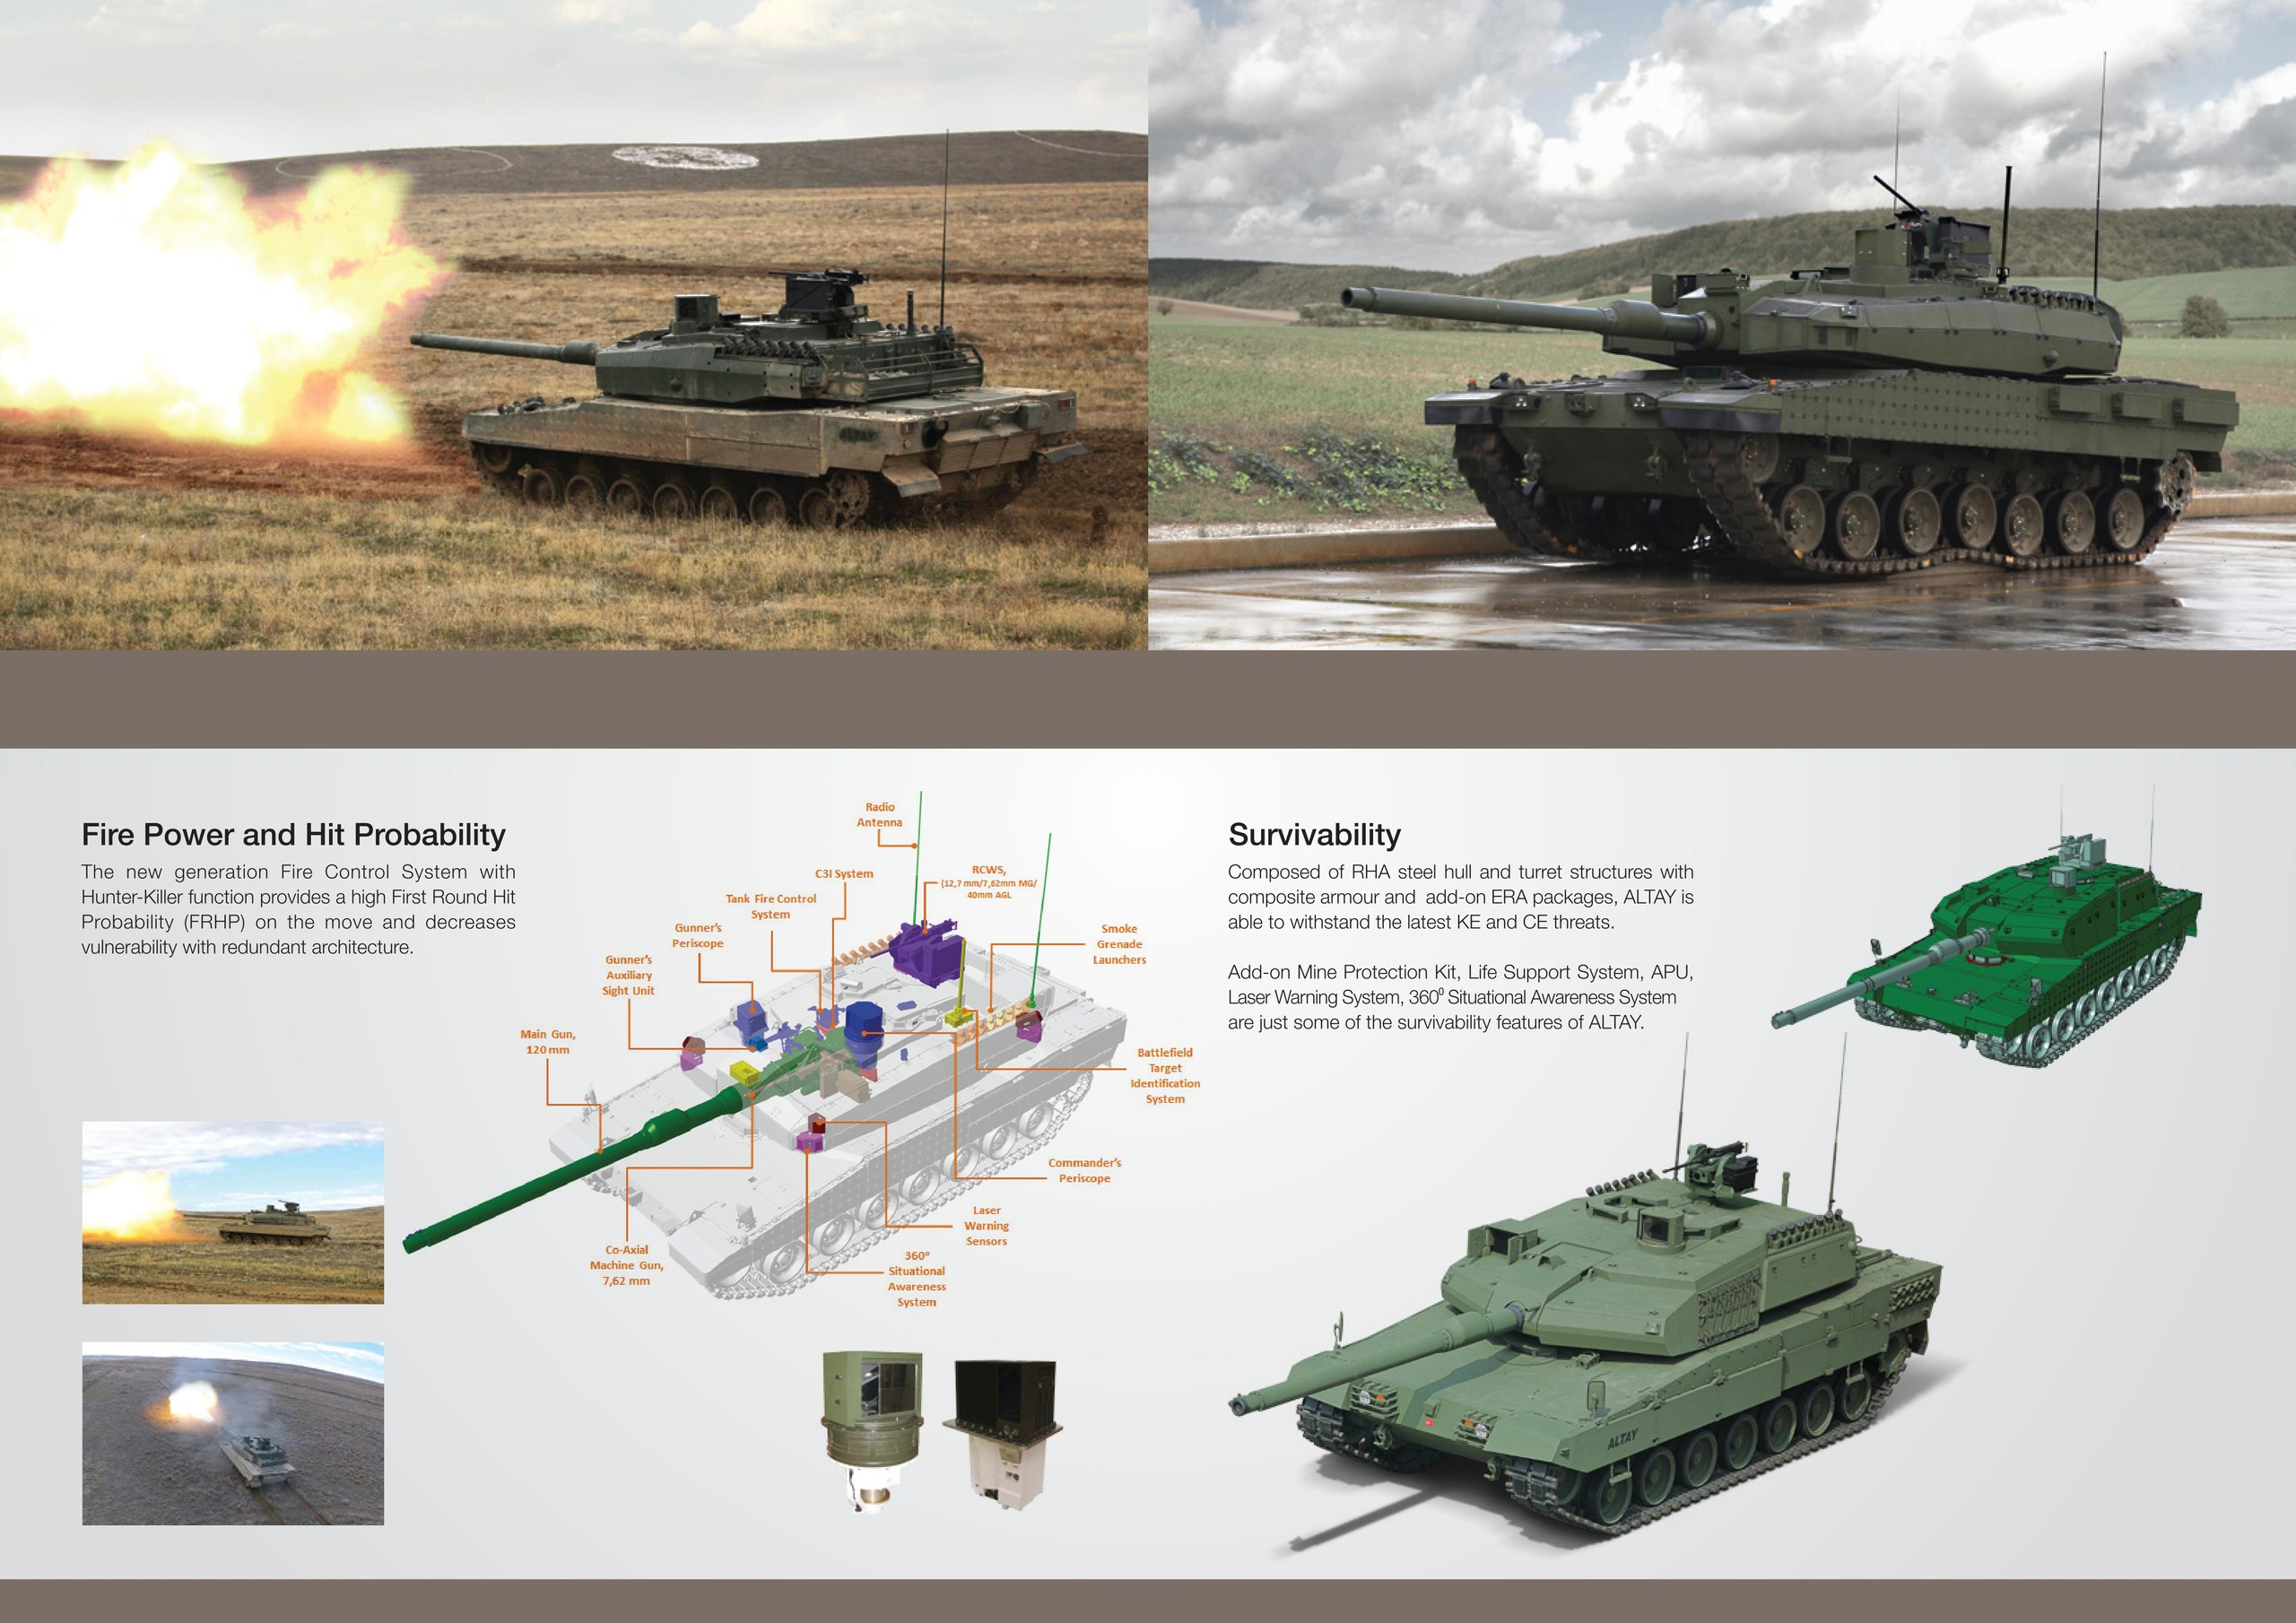 Turkish Ground Forces equipment AJgWmz